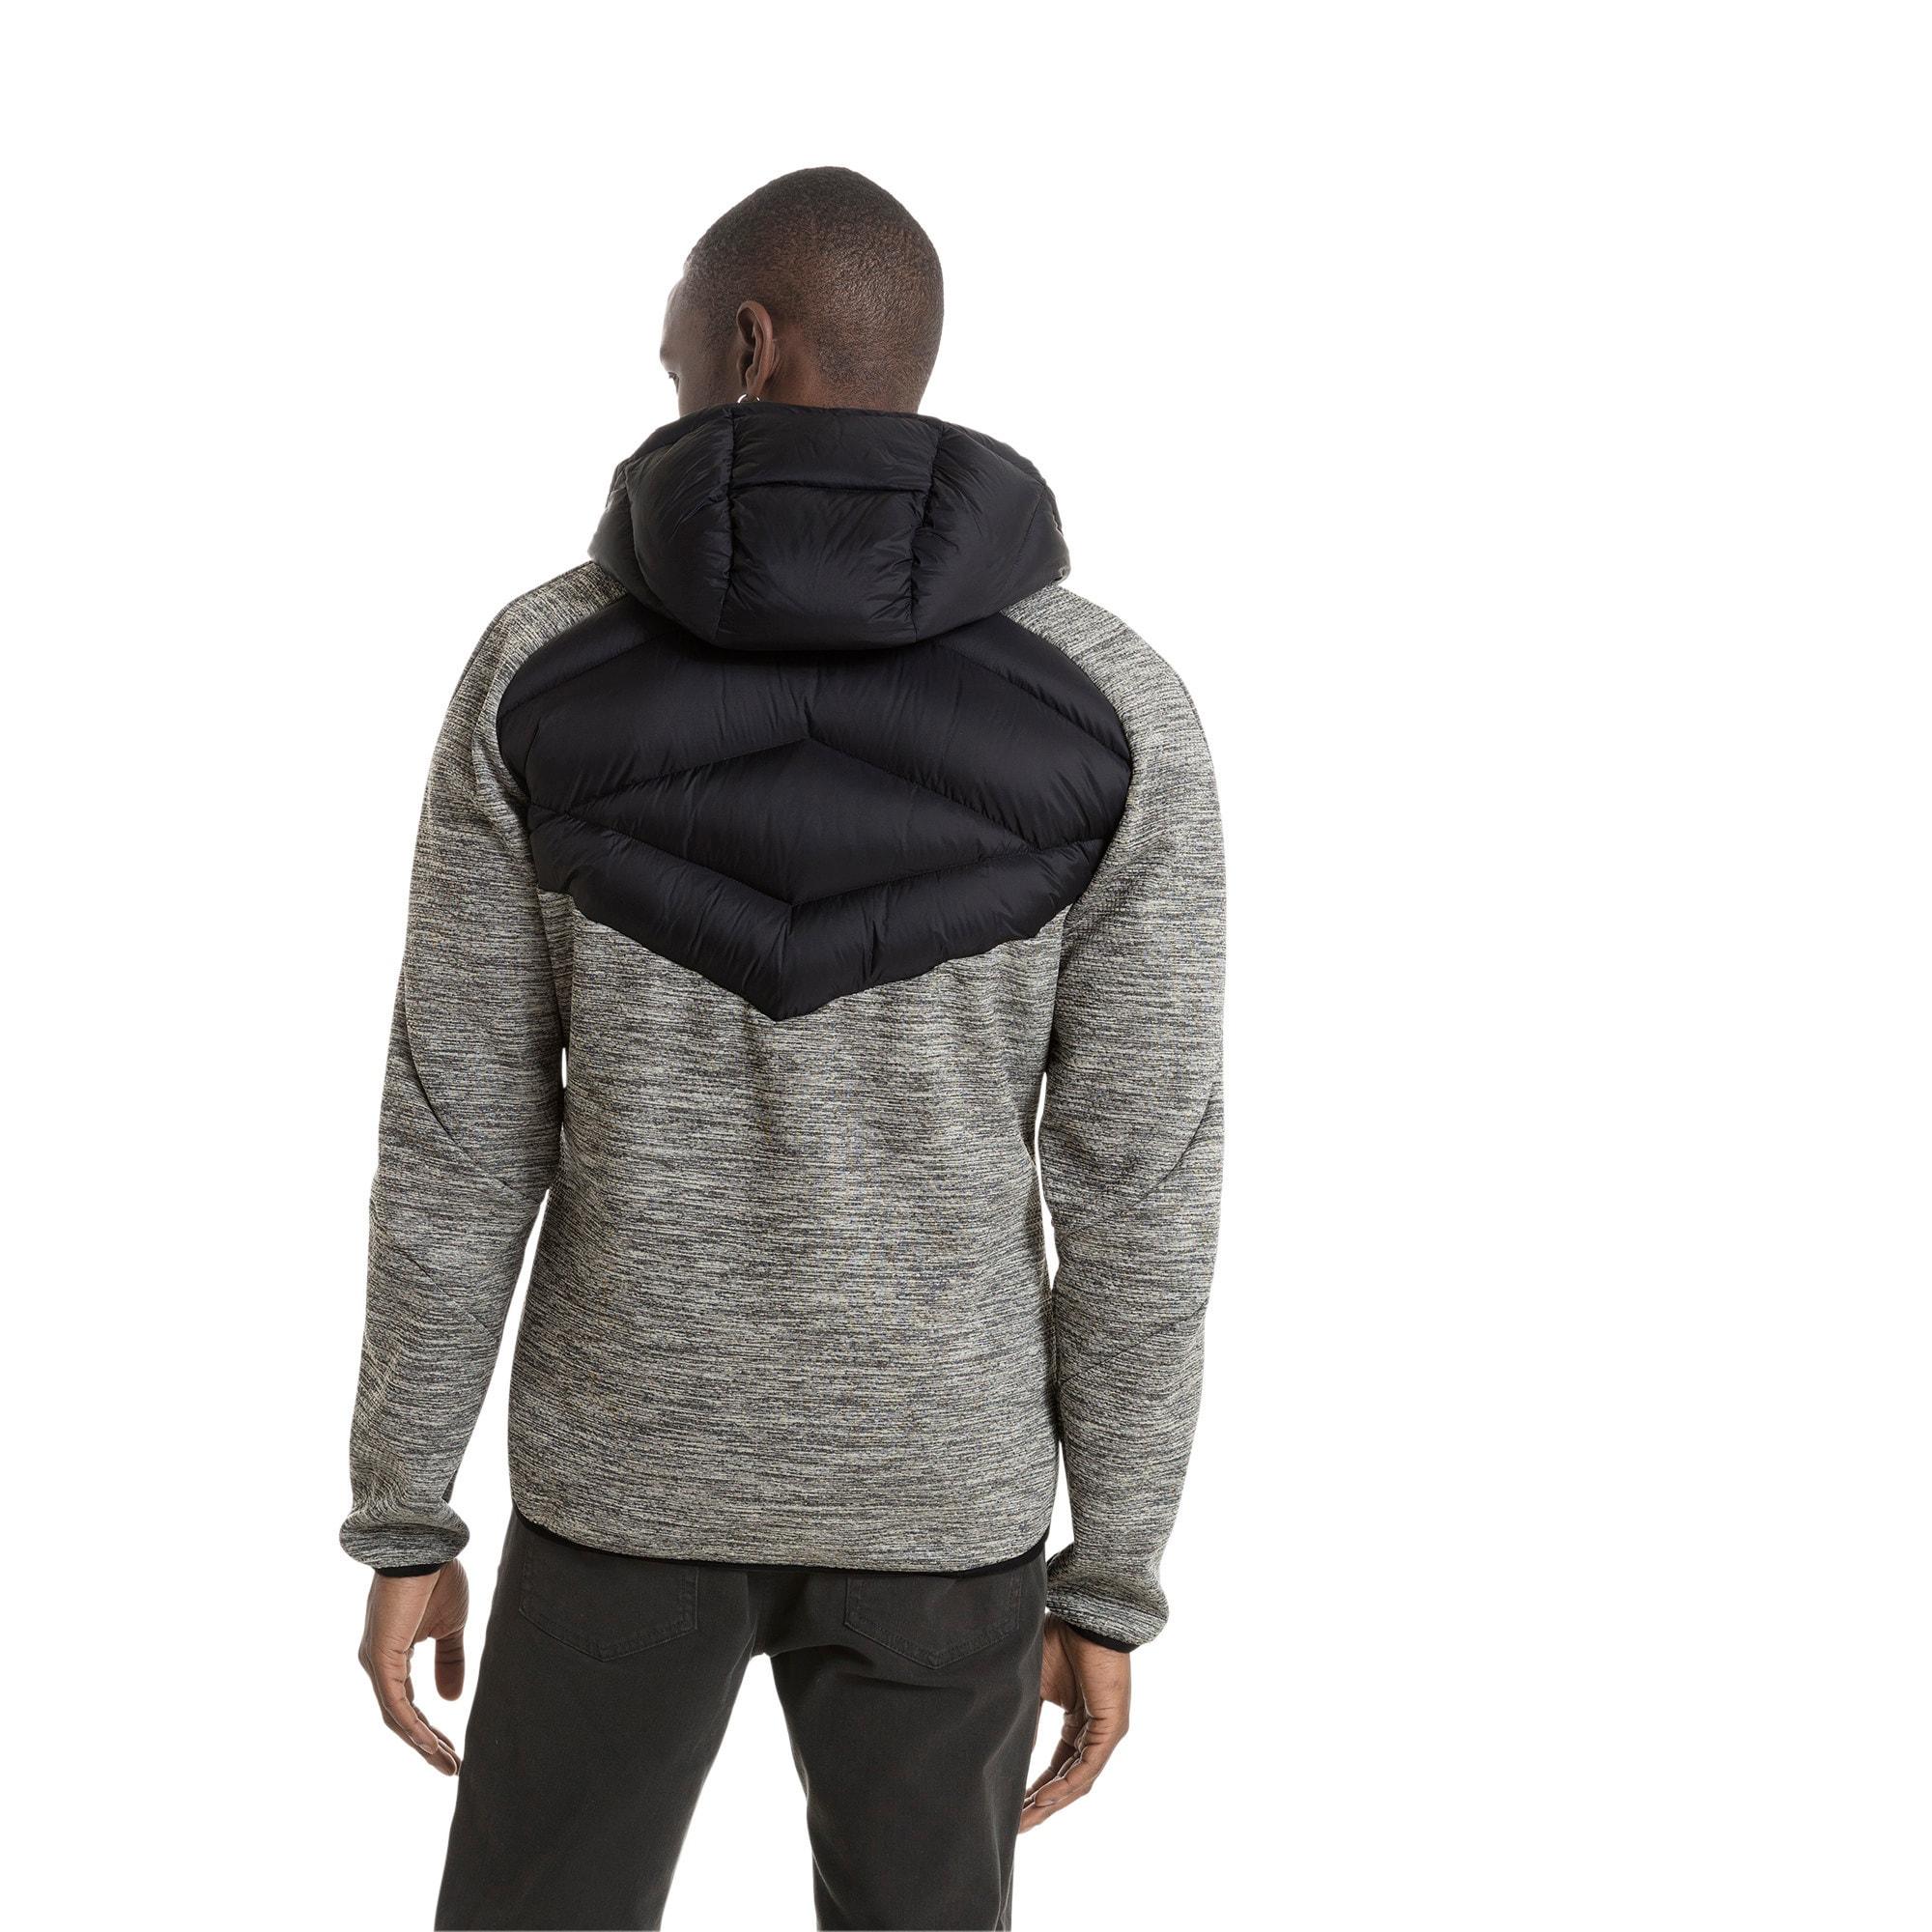 Thumbnail 2 of Double Knit Hybrid 600 Down Men's Jacket, MGH-Puma Black, medium-IND